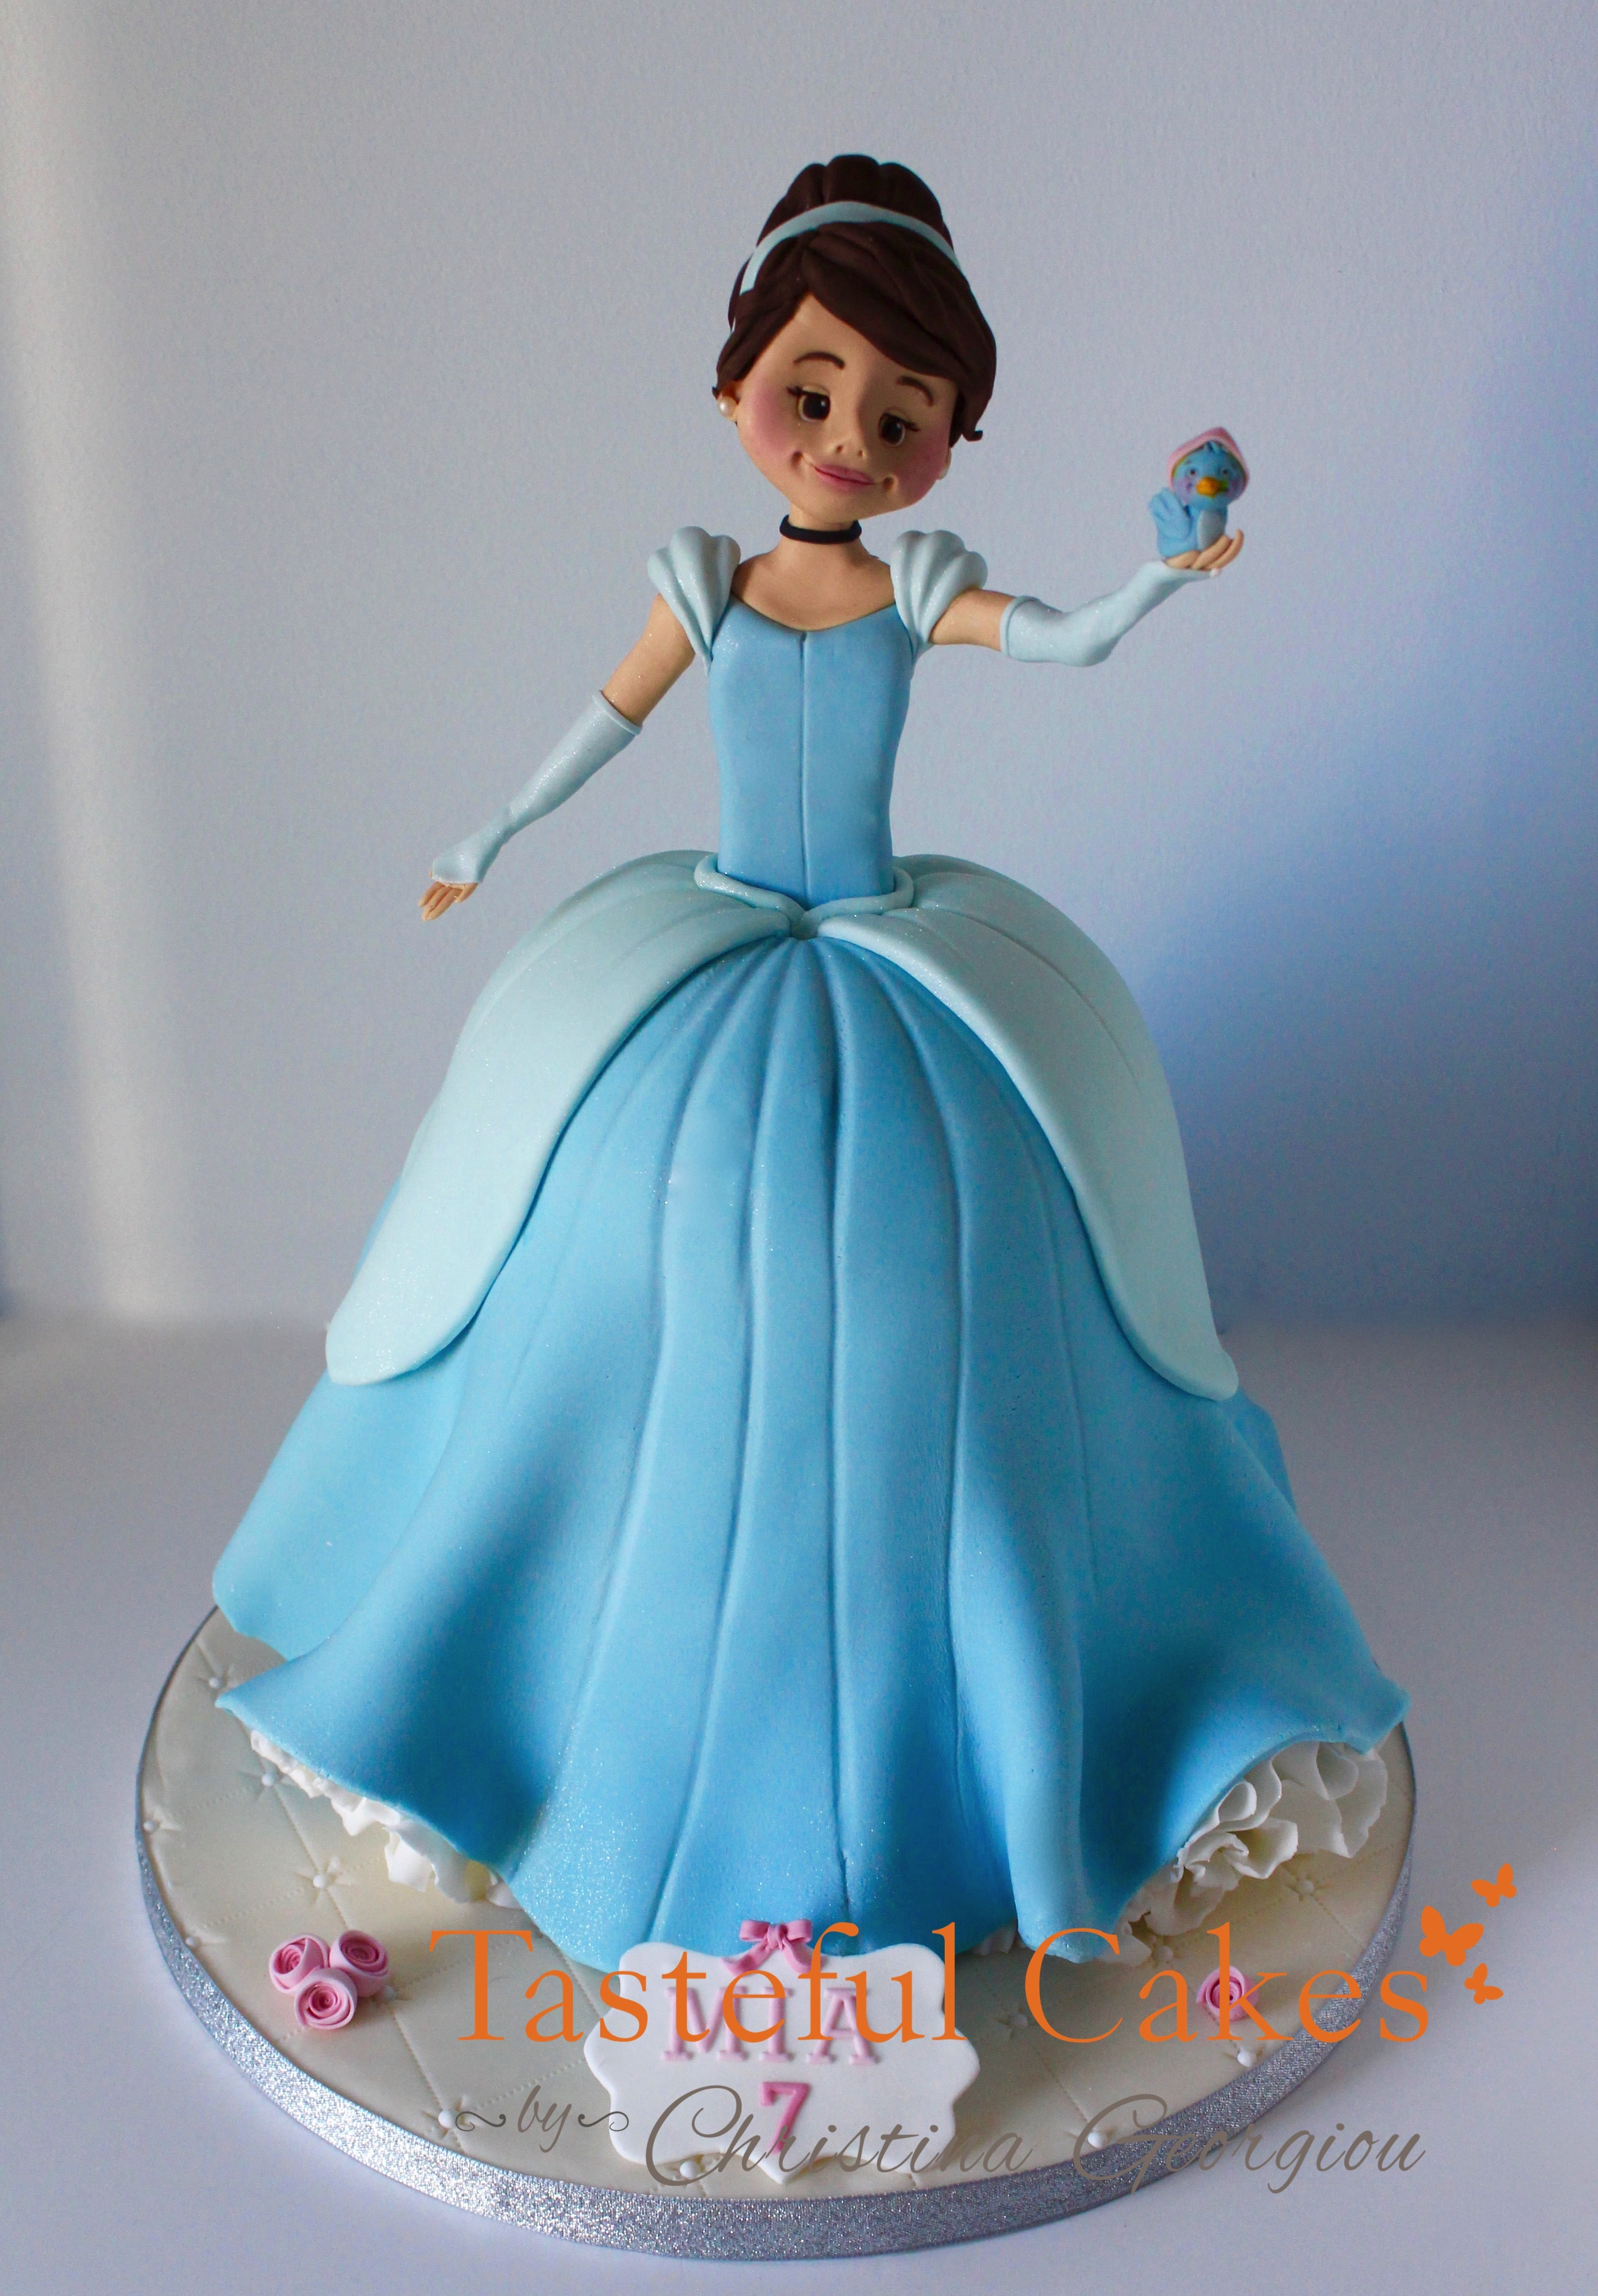 Tasteful Cakes By Christina Georgiou A Personalised Cinderella